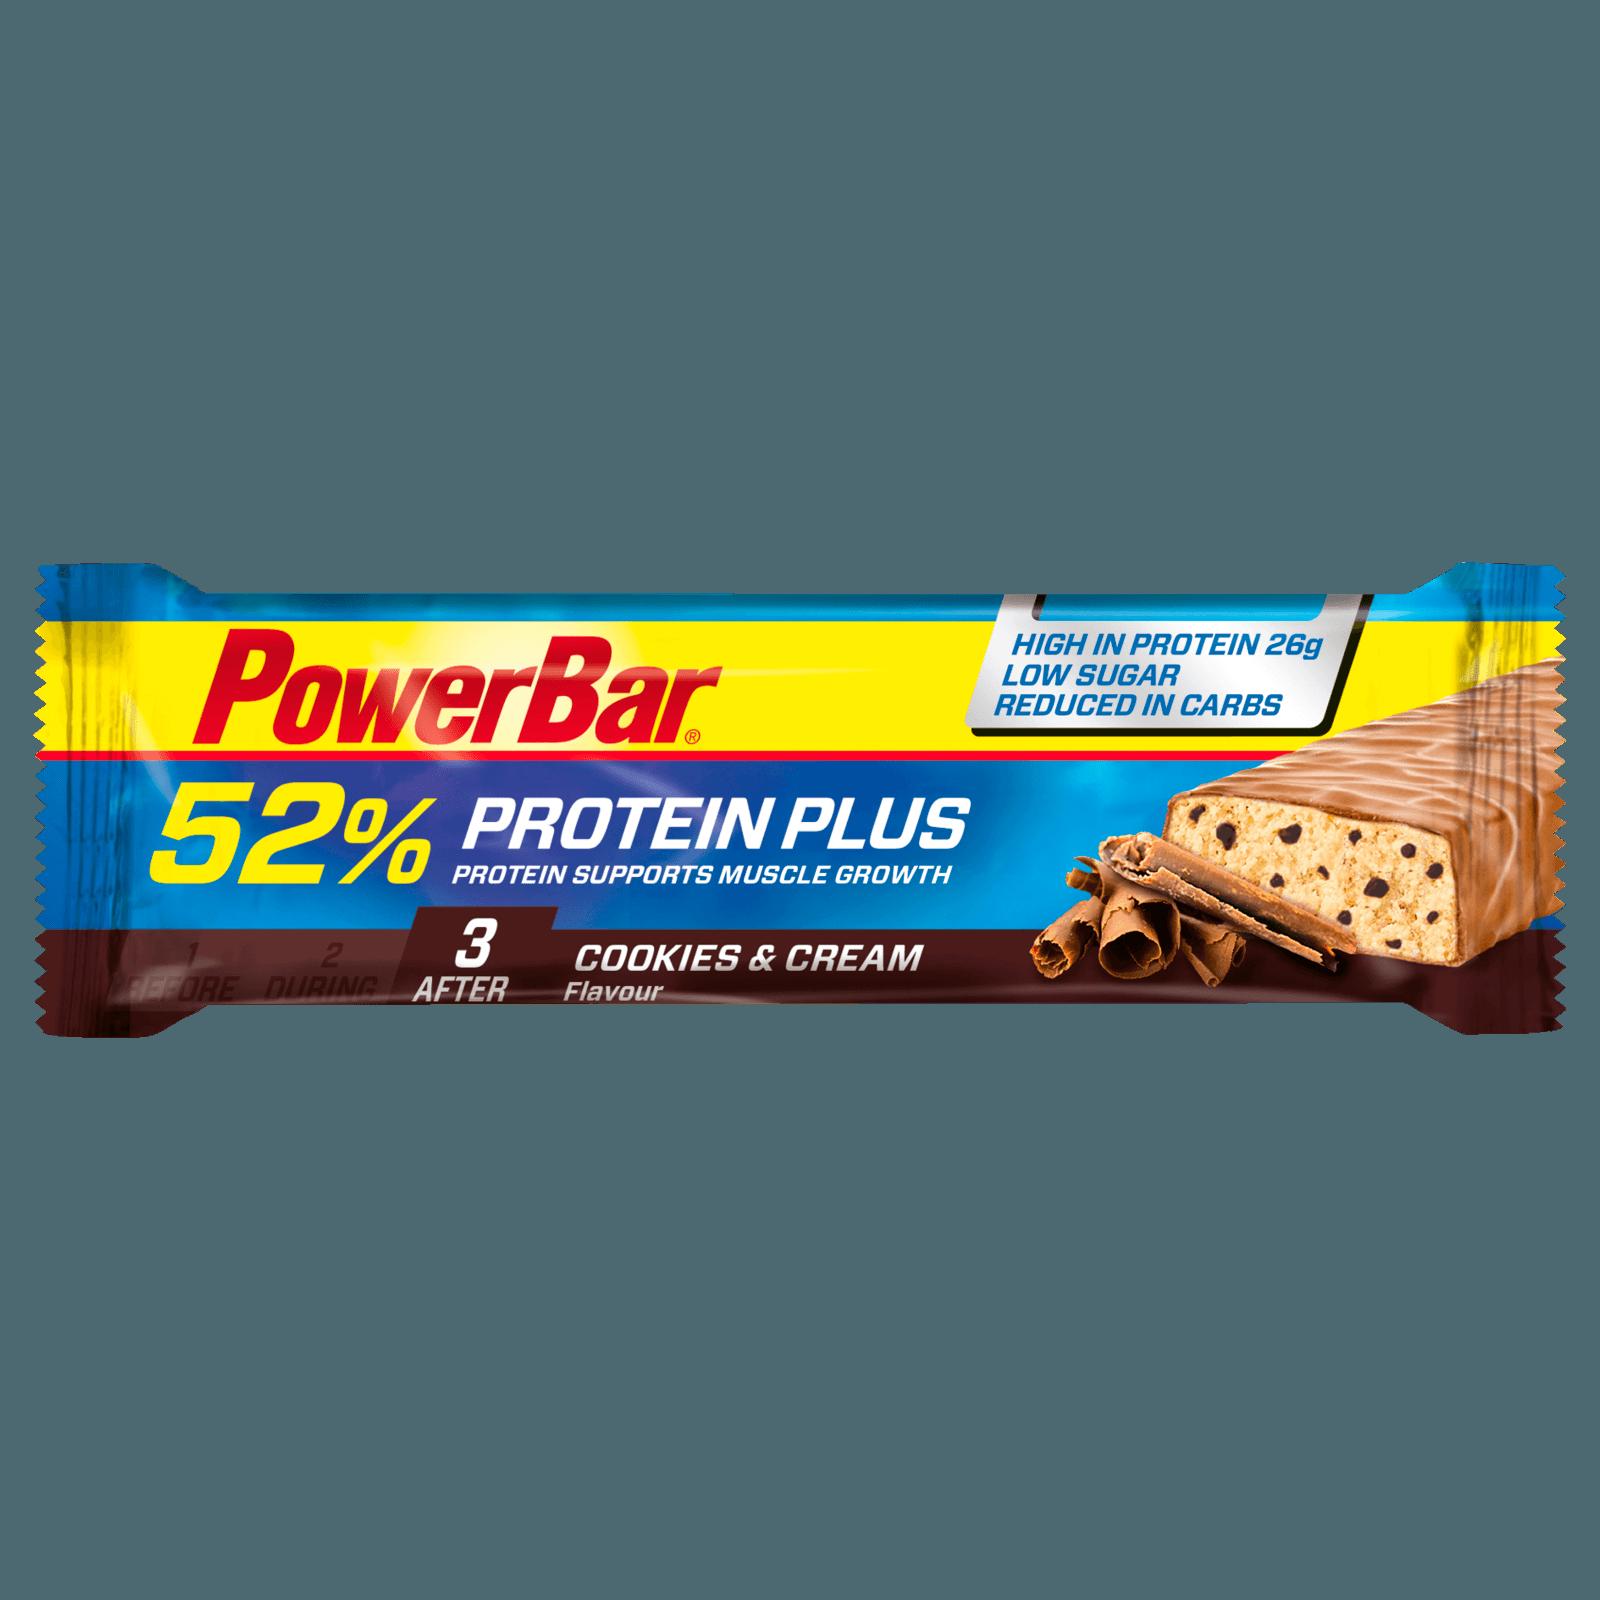 PowerBar 52% Protein Plus Cookies & Cream 50g